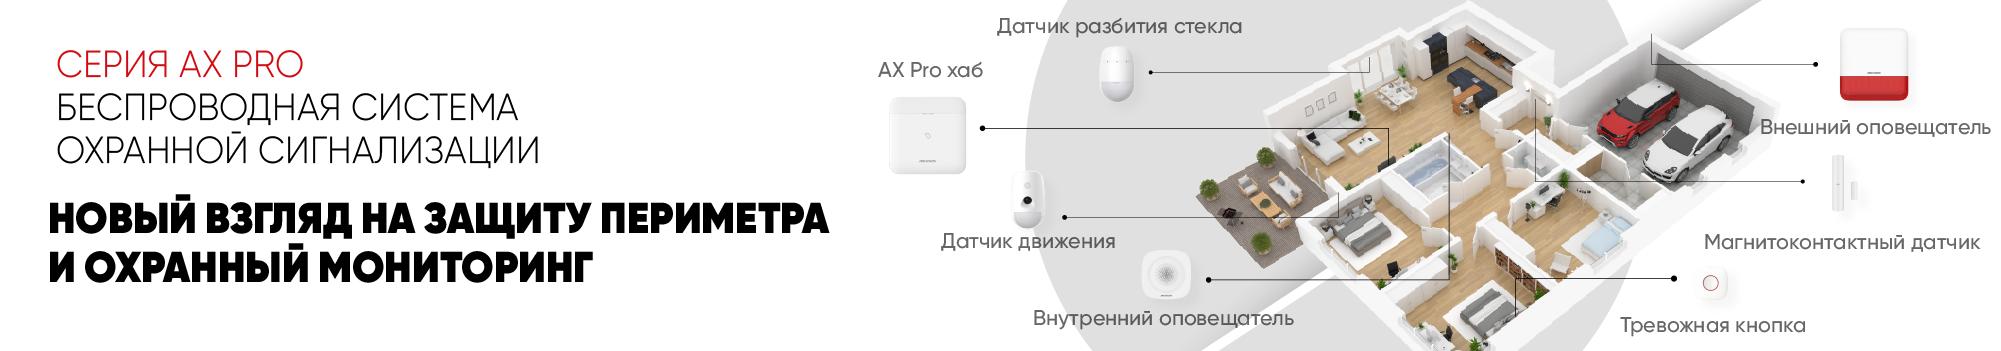 13_ru_ax_pro_series_banner_200720_2000